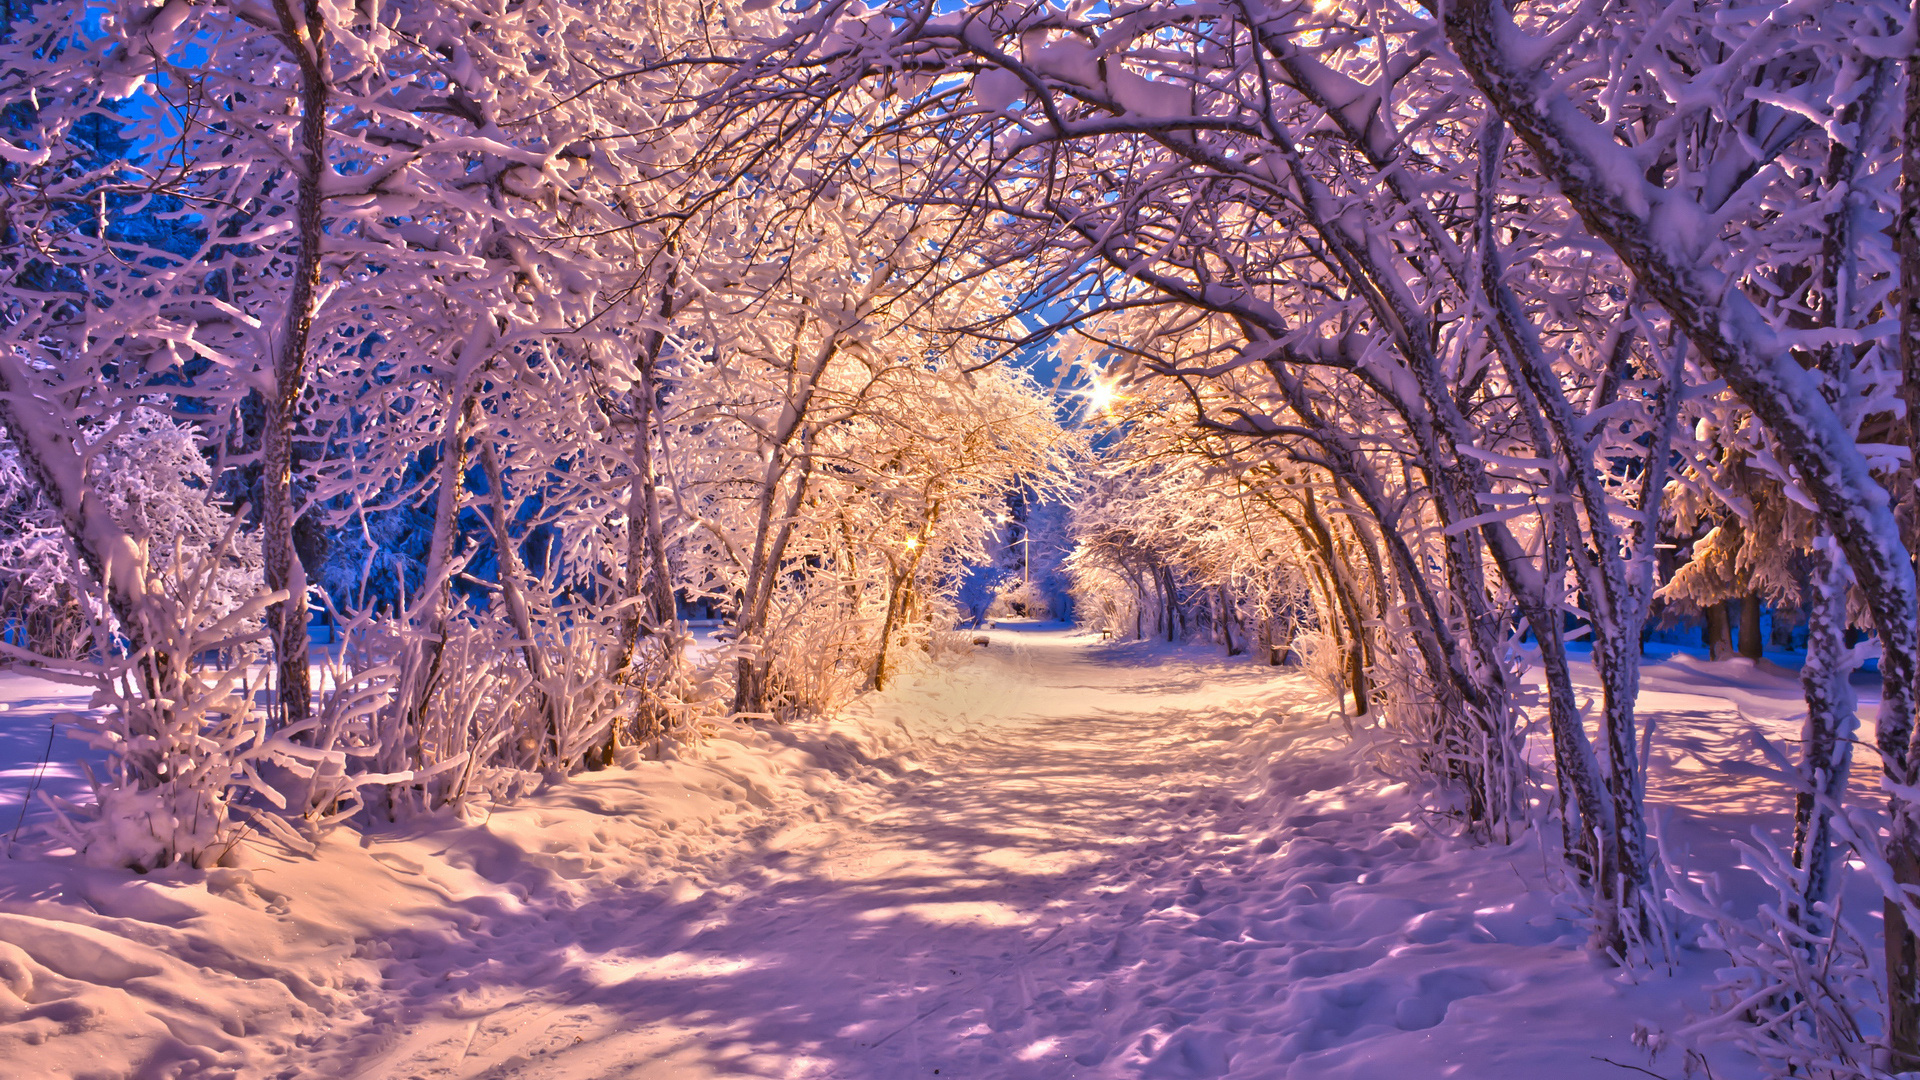 snow christmas sidewalk roads lights white trees wallpaper background 1920x1080